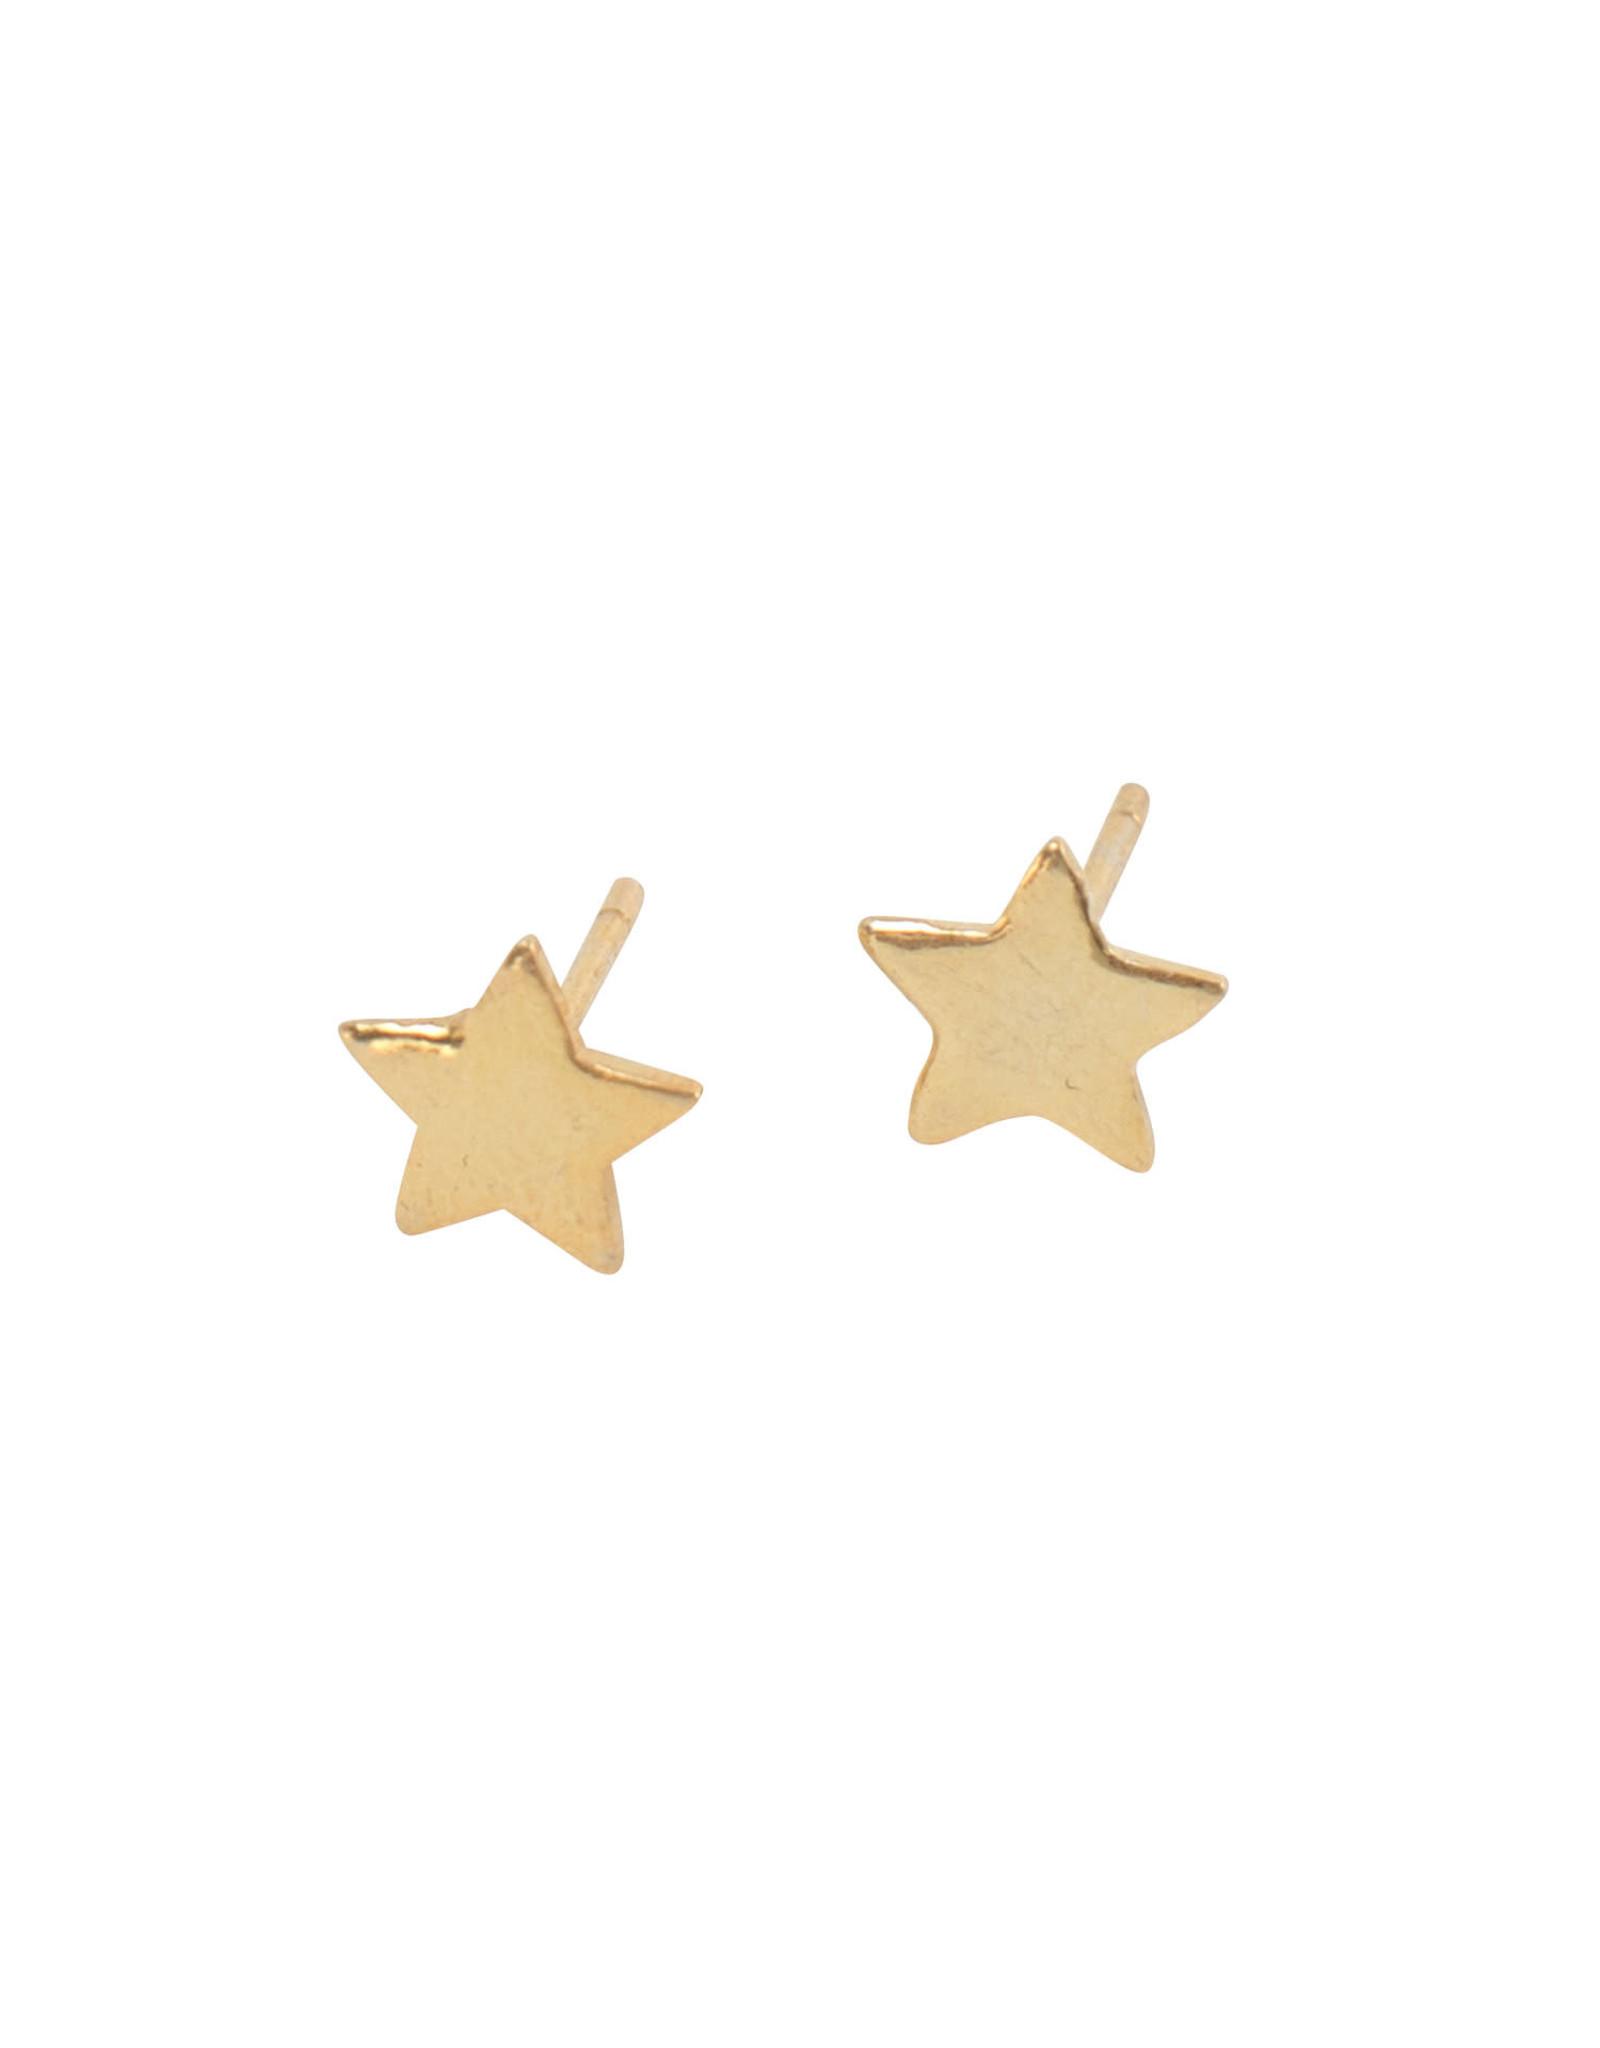 TTV USA Star Bright Earrings, India